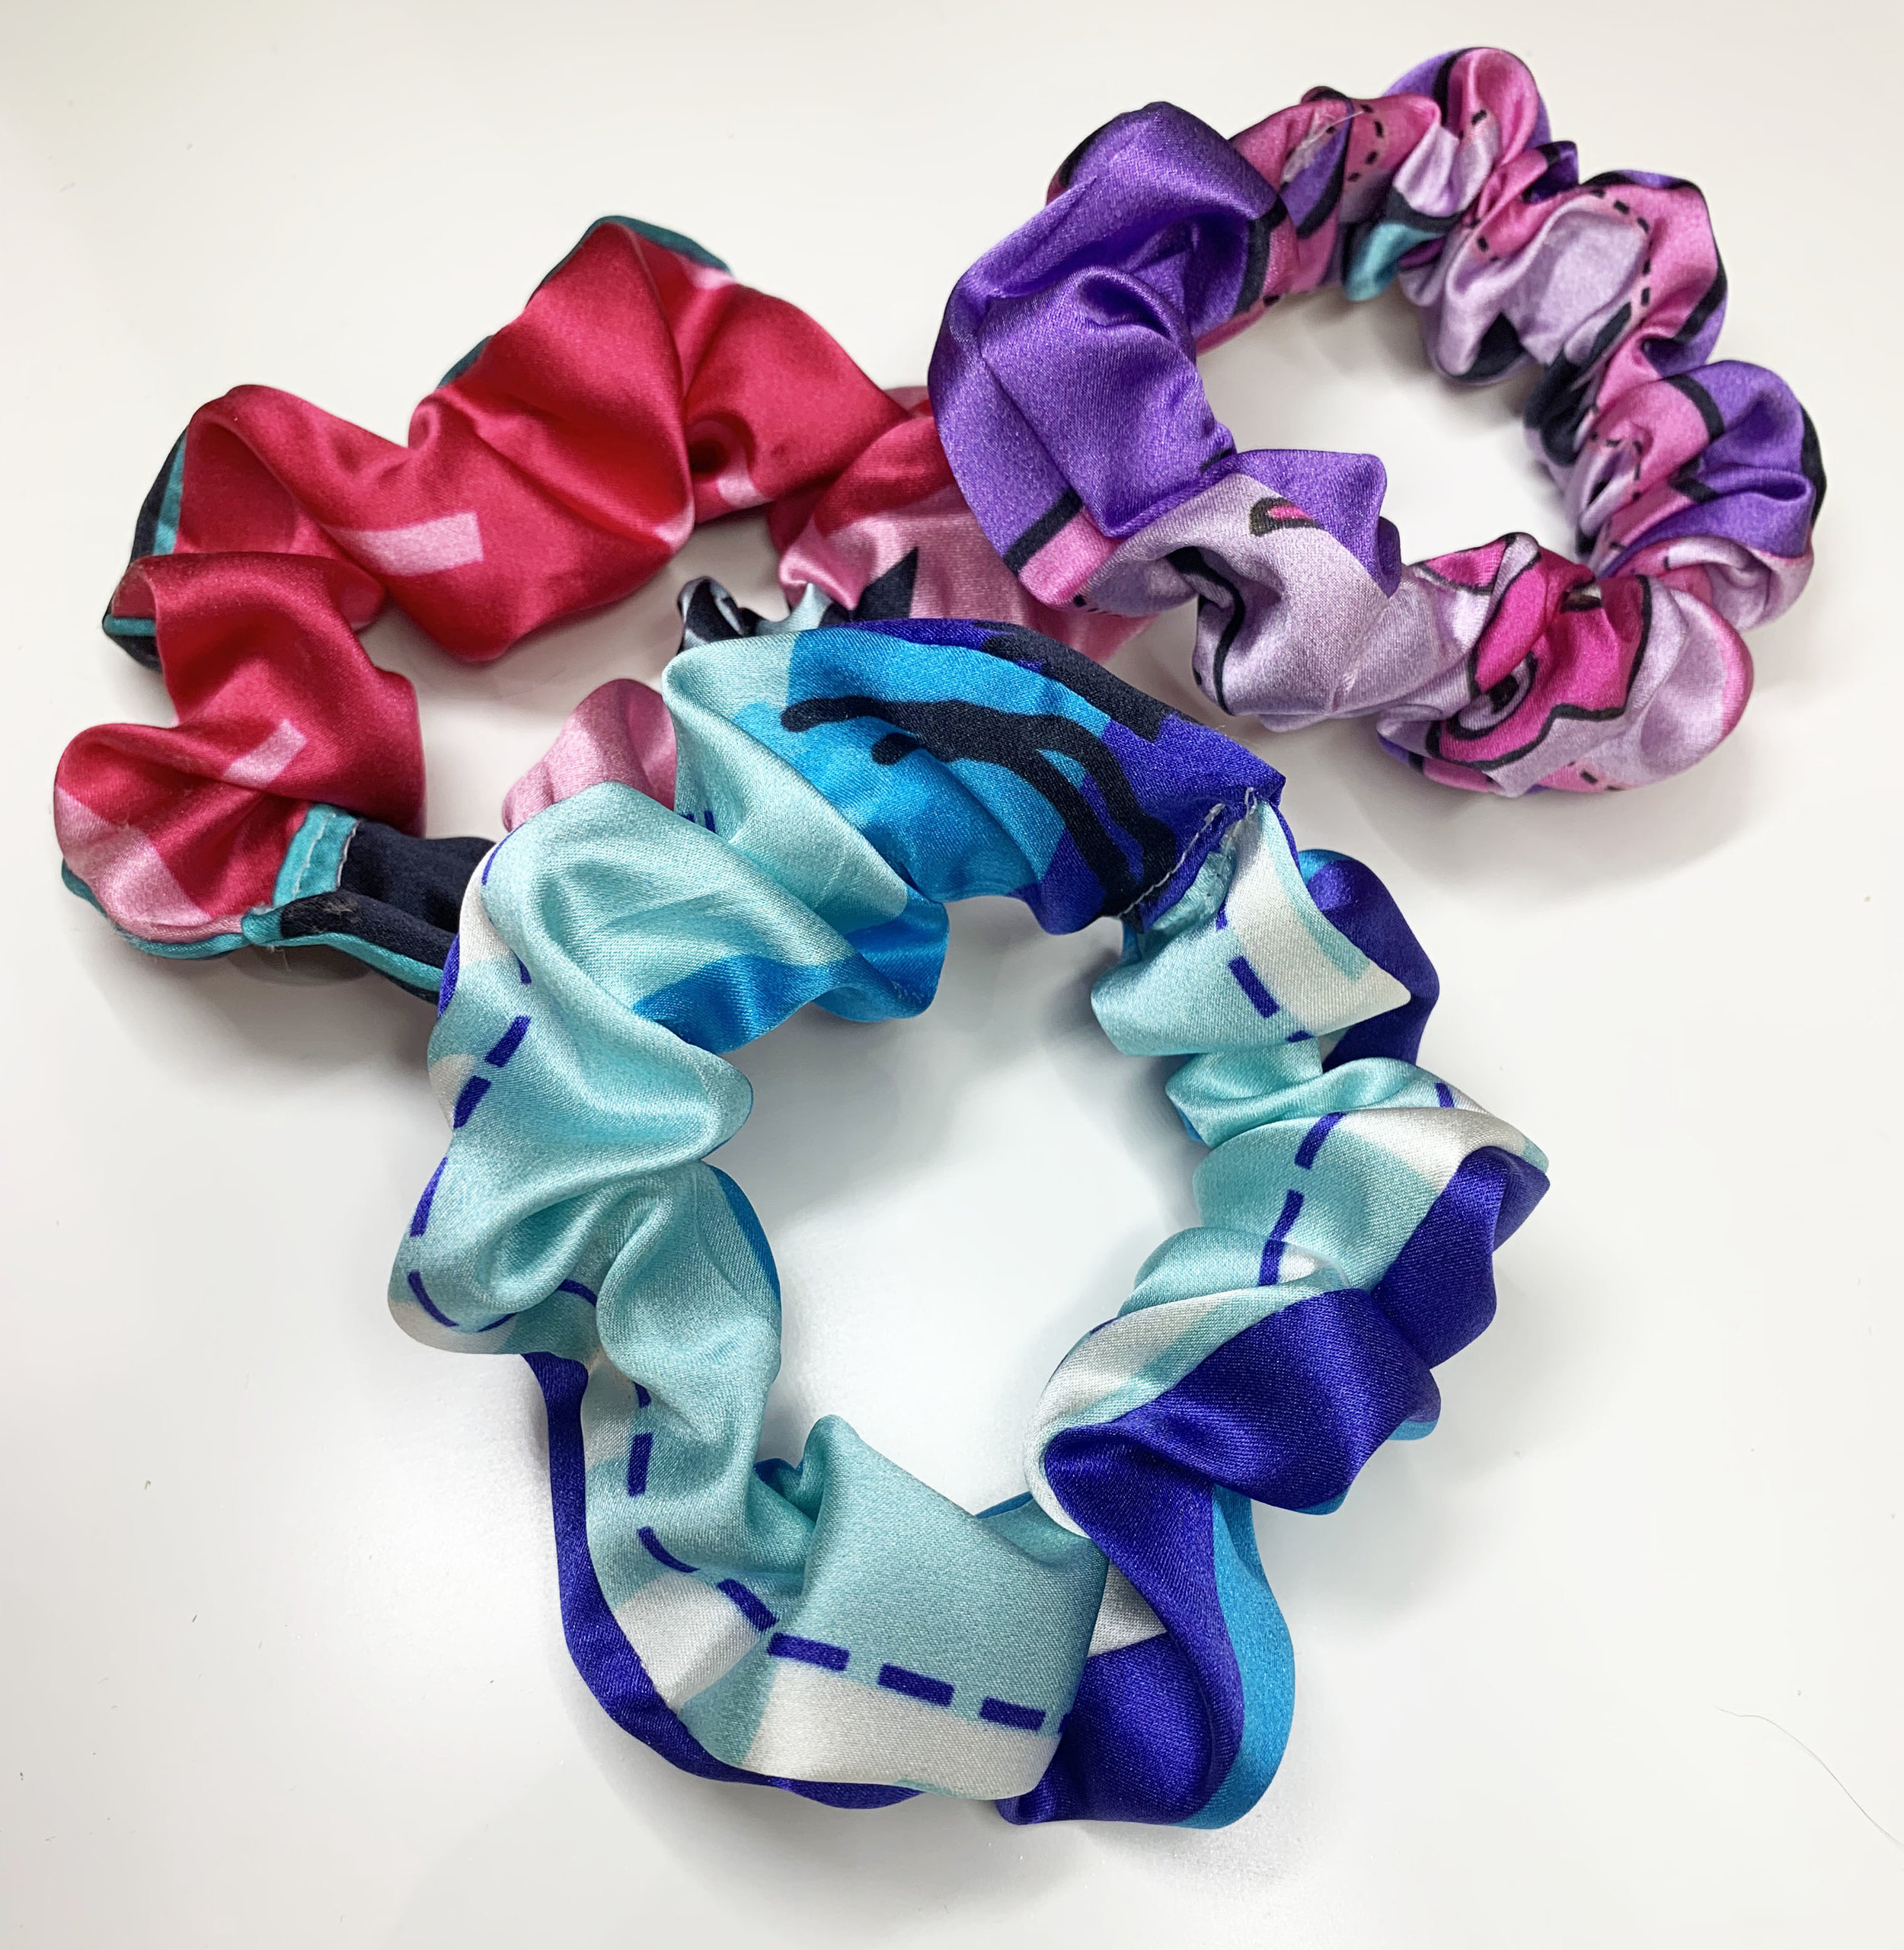 100% Silk Remnant Scrunchies